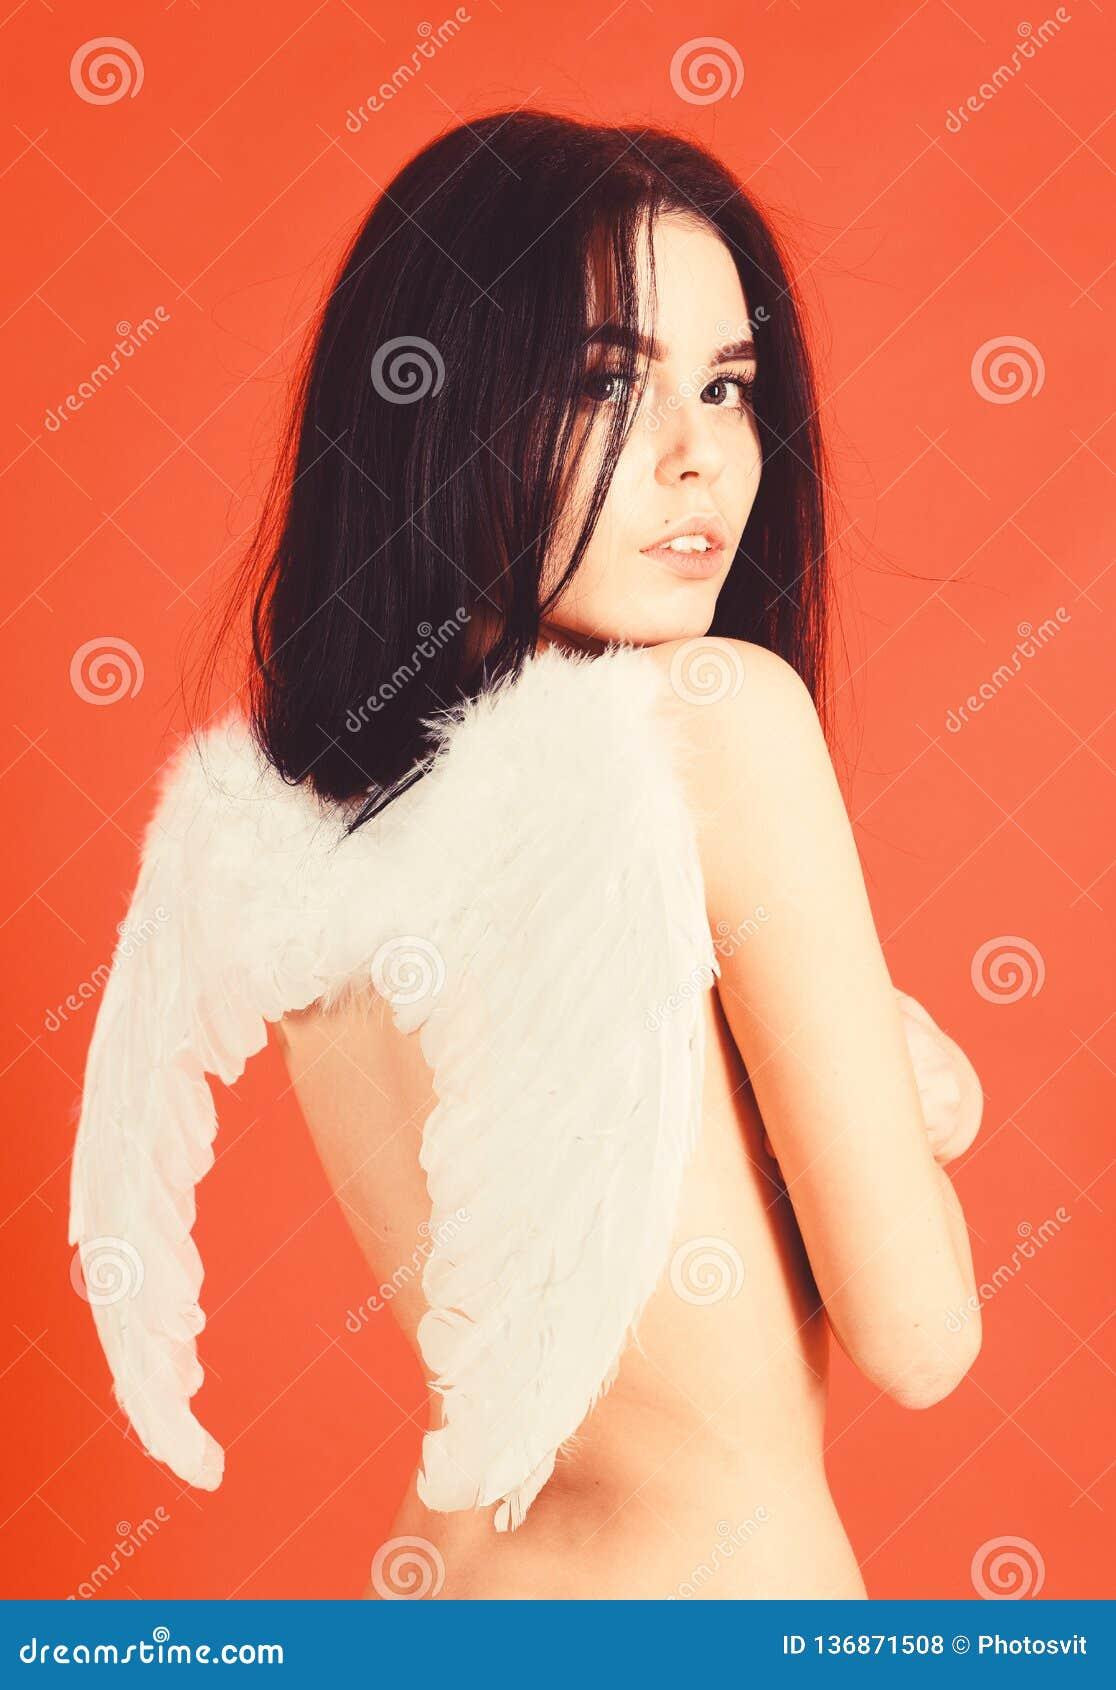 sexy engel nackt